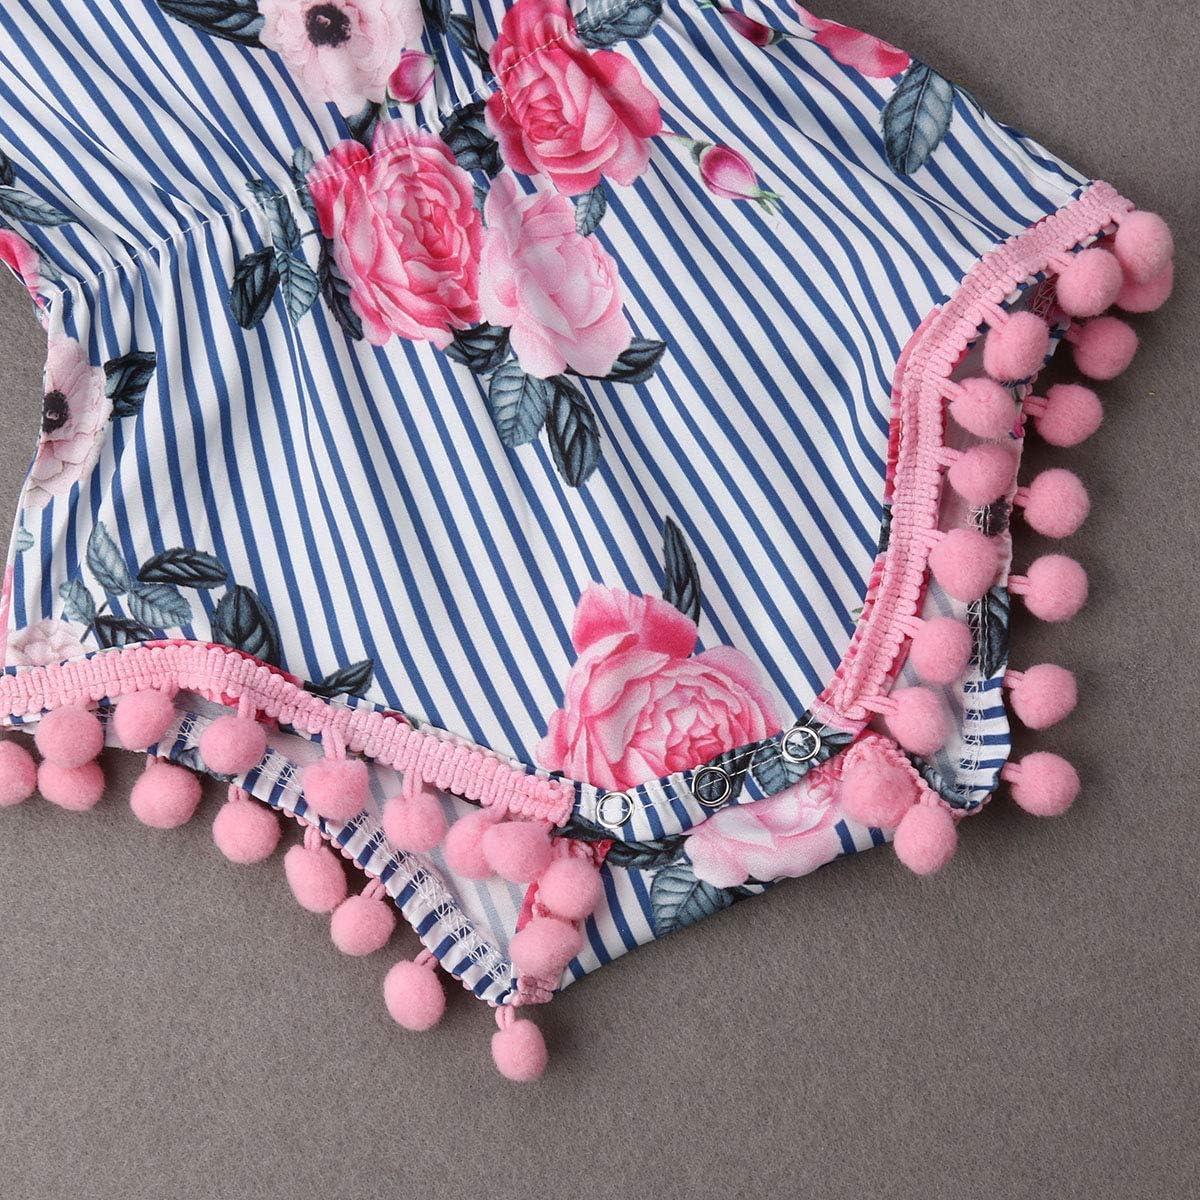 MysterLuna Cute Newborn Baby Girl One-Piece Cactus Tassel Pompom Sleeveless Romper Jumpsuit Bodysuit Outfit